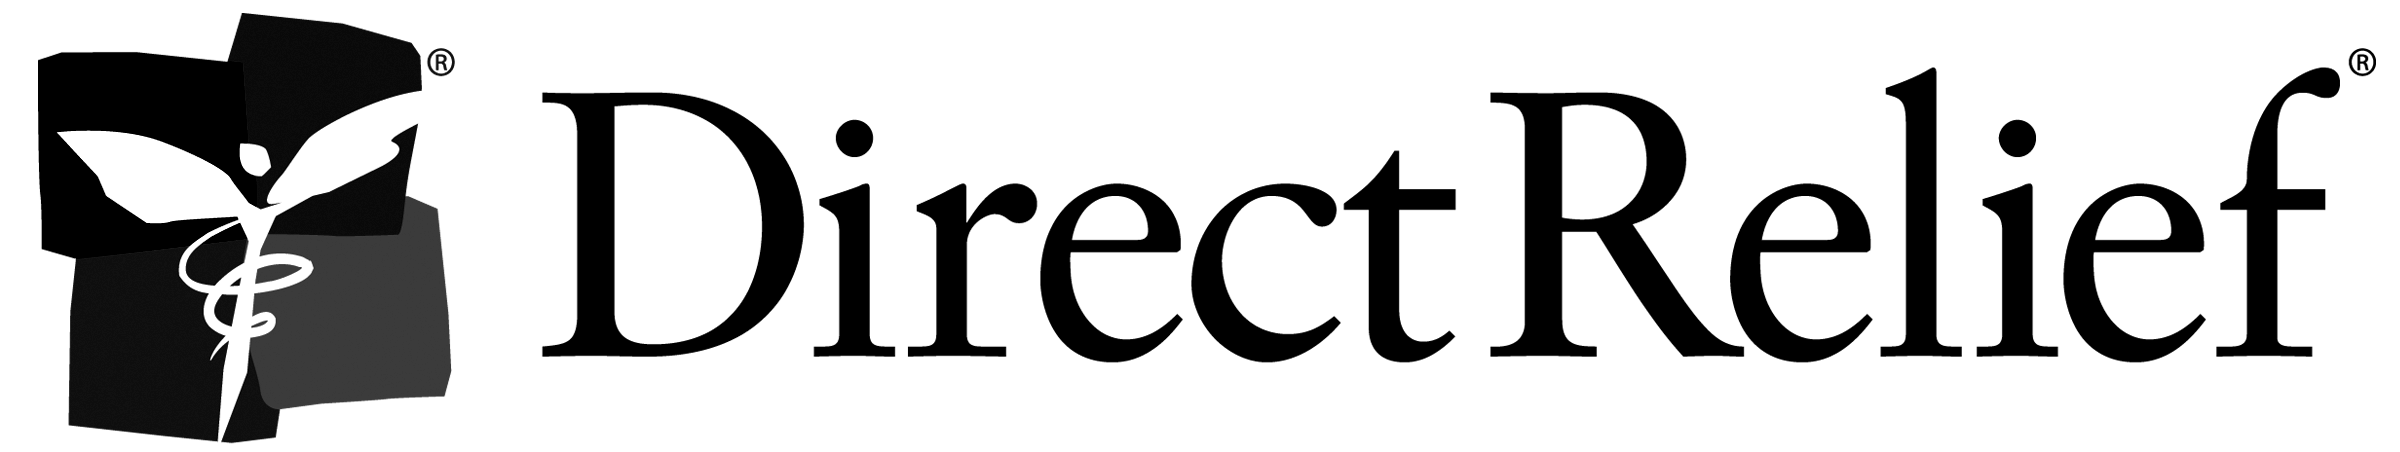 DR_Logo_notag_CMYK_2400x452